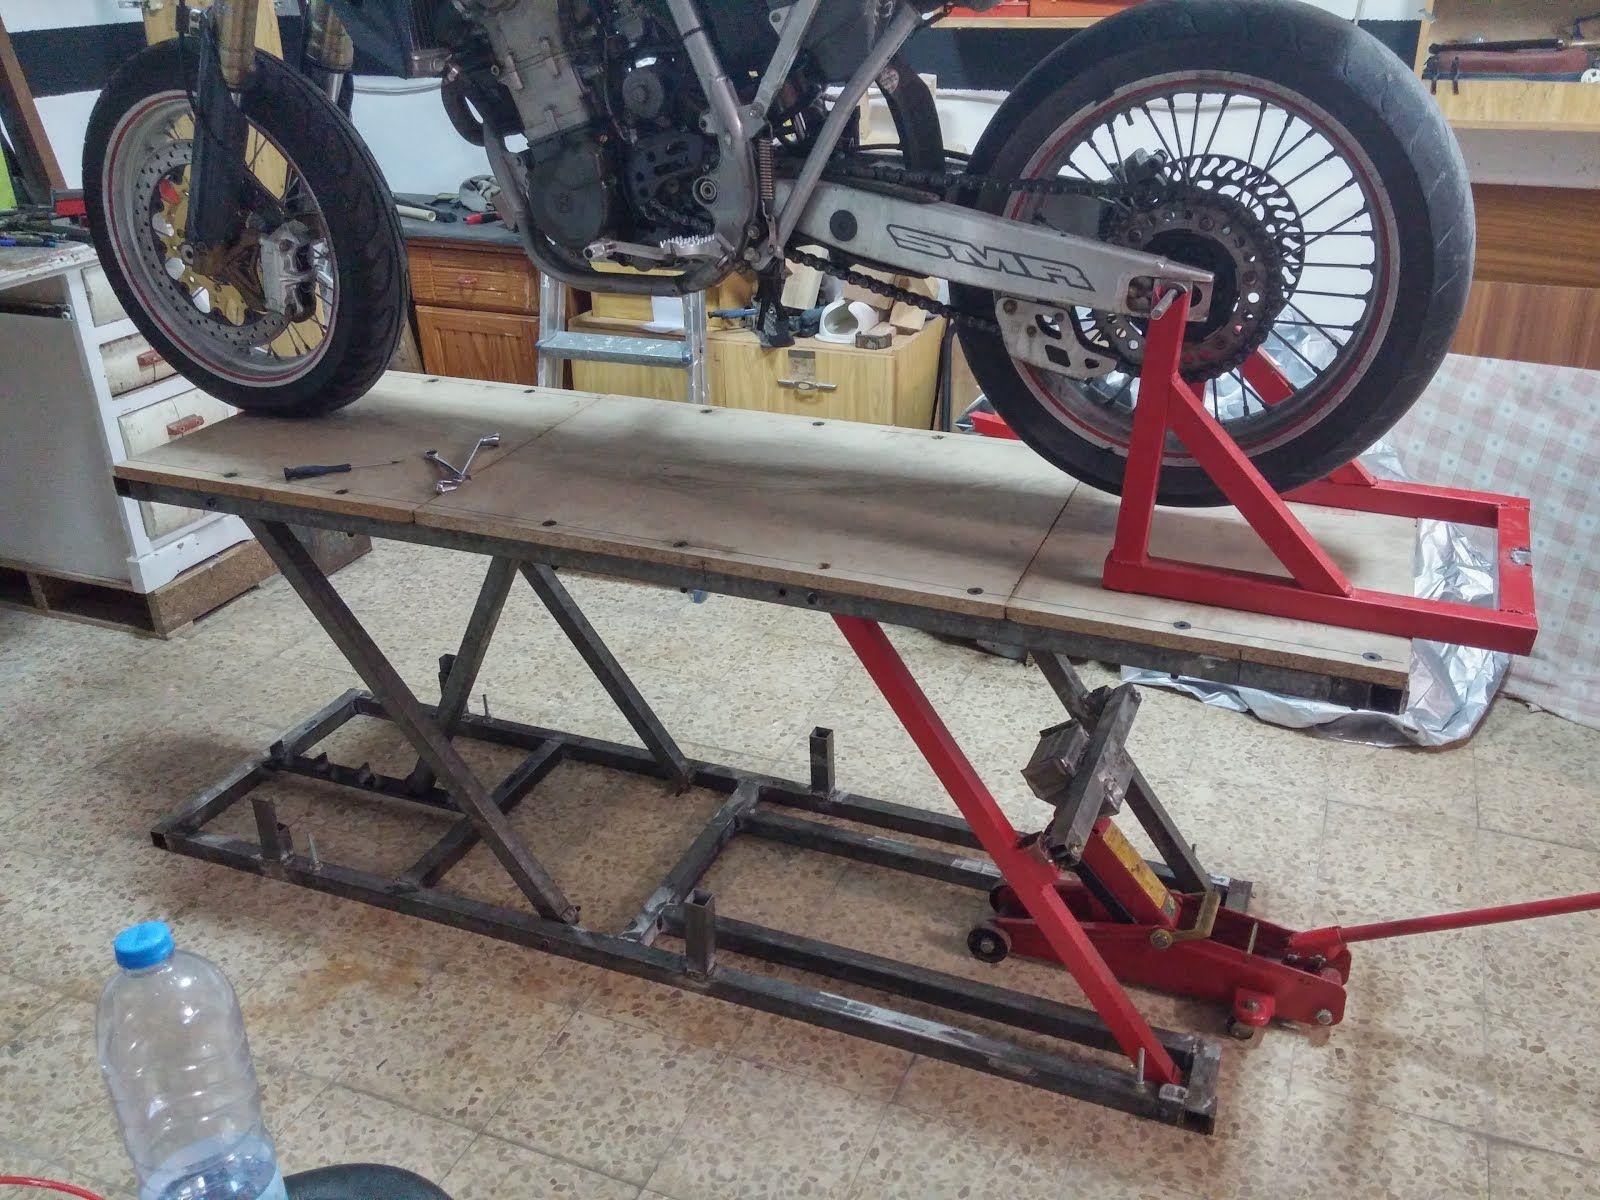 Madeathomestuff Homemade Bike Lift Metalwork Pinterest Bike Lift Work On And Homemade